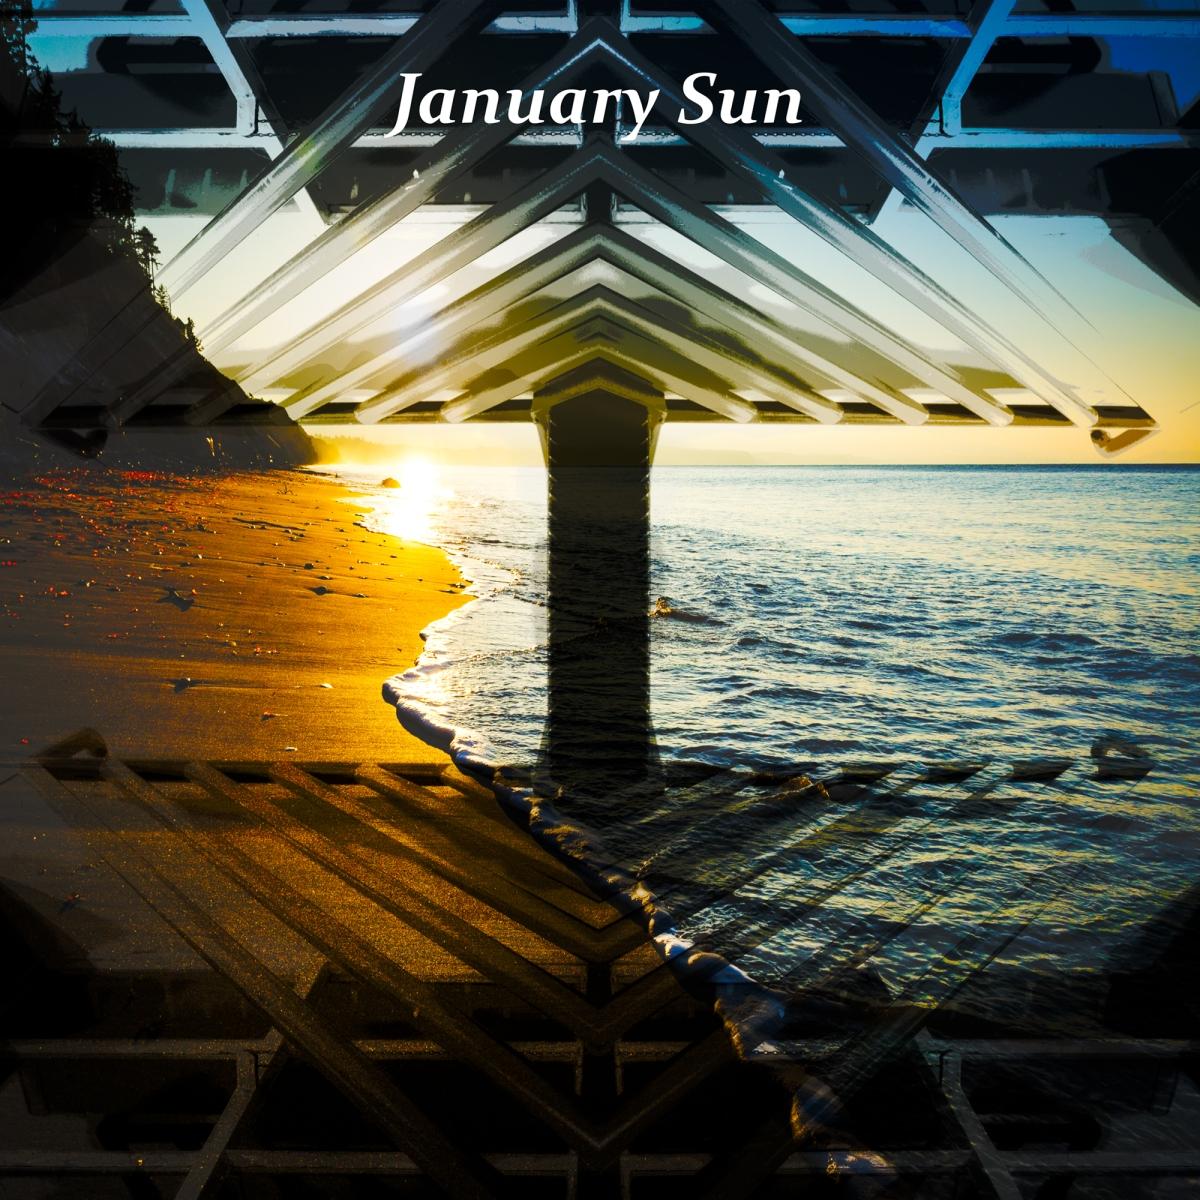 Music: January Sun